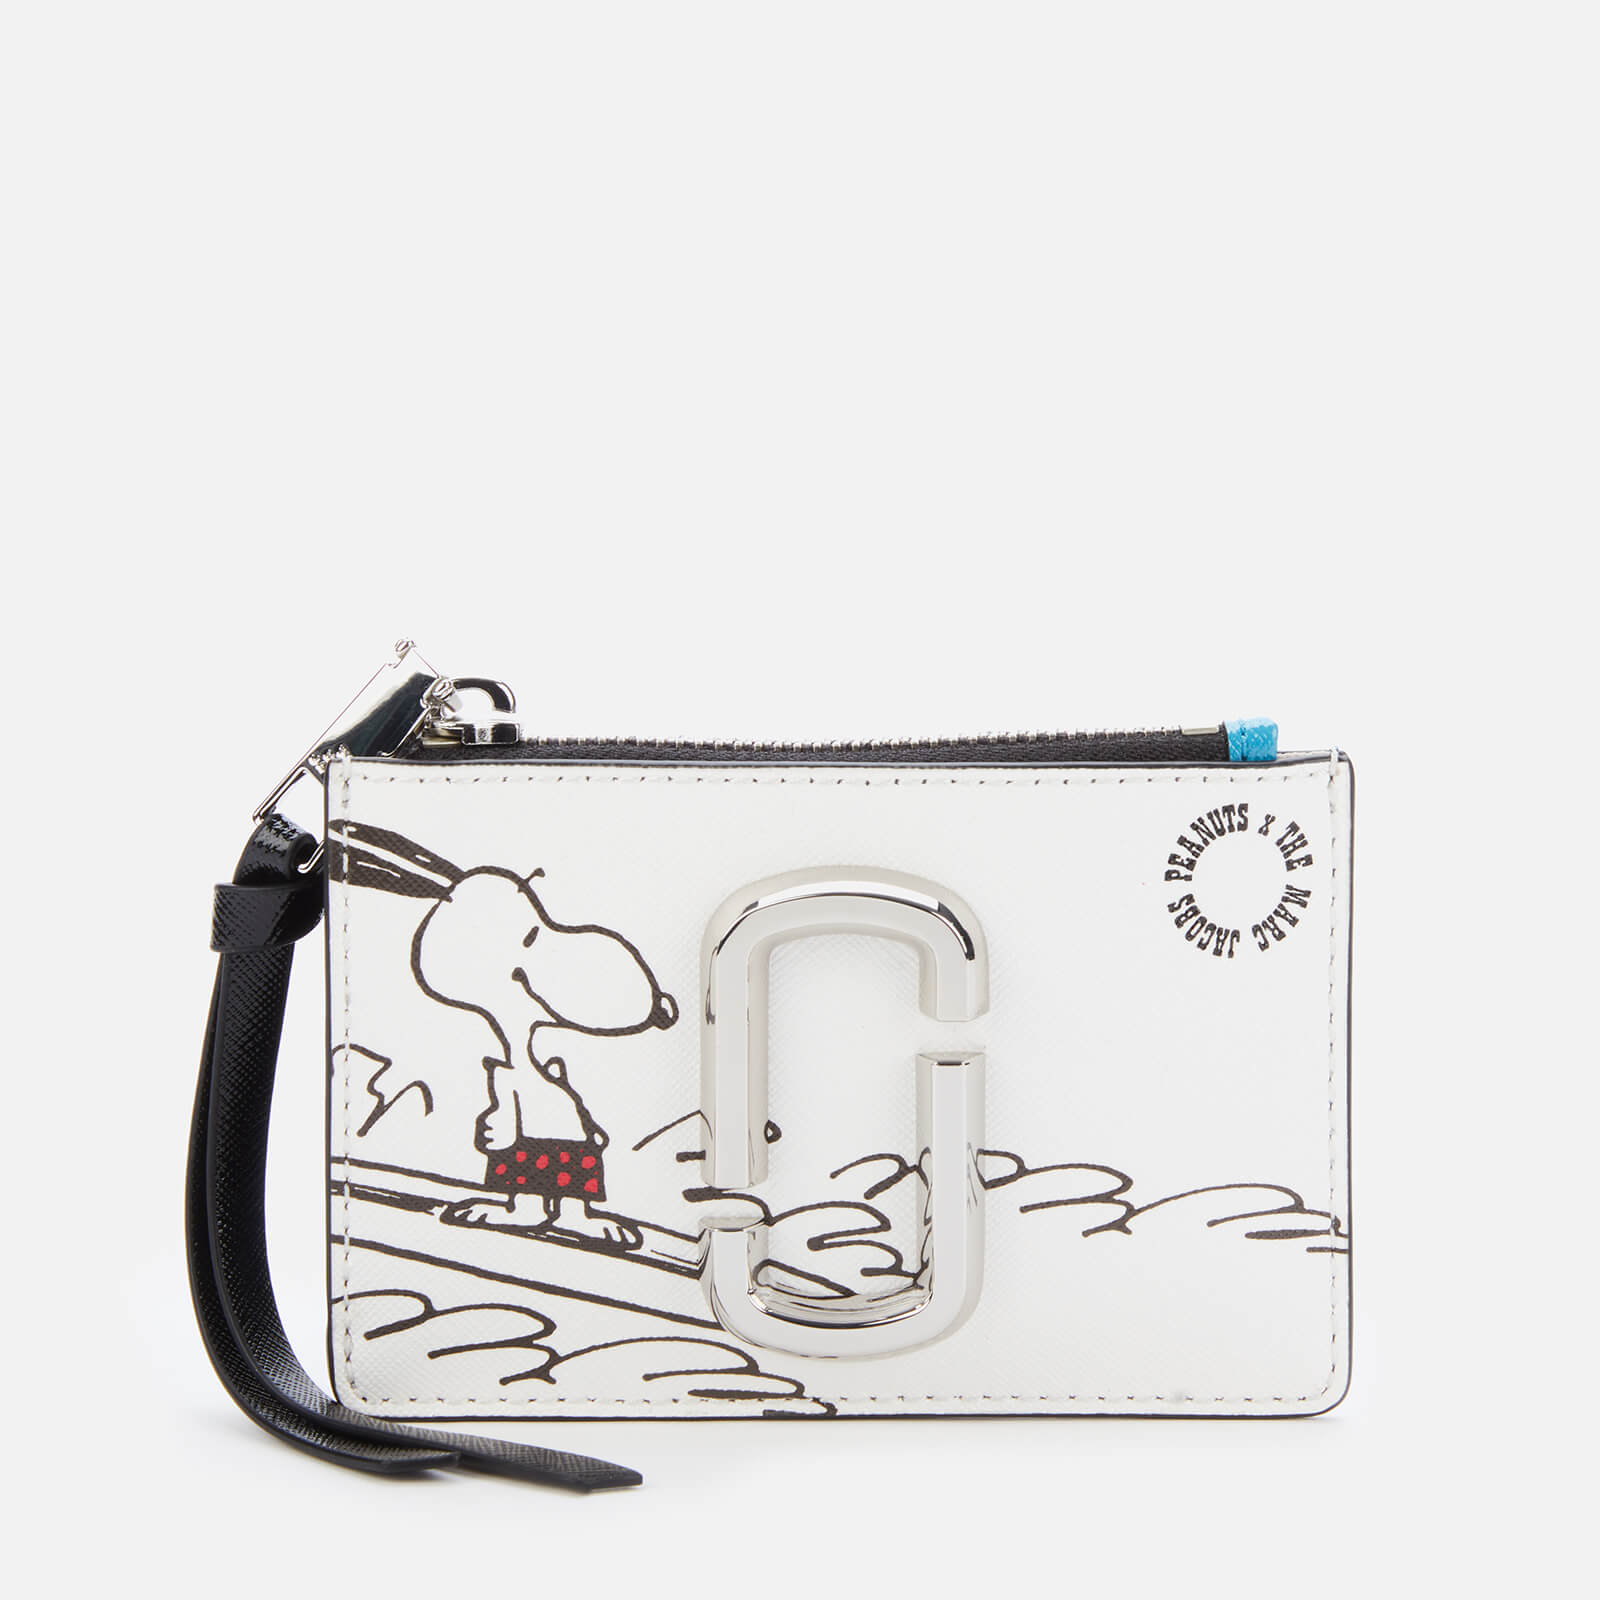 Marc Jacobs Women's Snapshot Peanuts Americana Top Zip Multi Wallet - White Multi